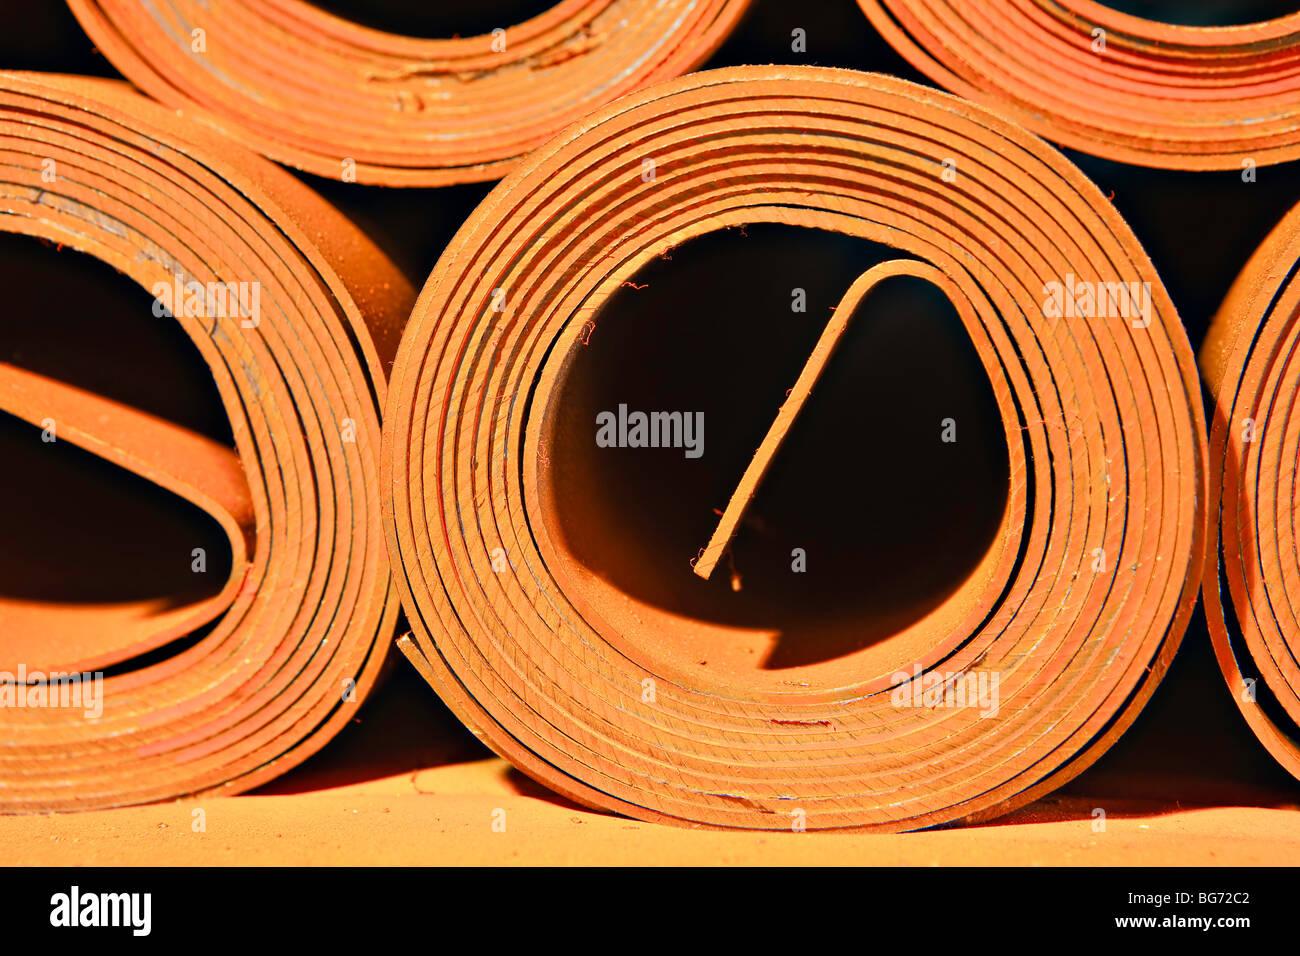 Rolls of lead, Mississauga, Ontario, Canada. - Stock Image